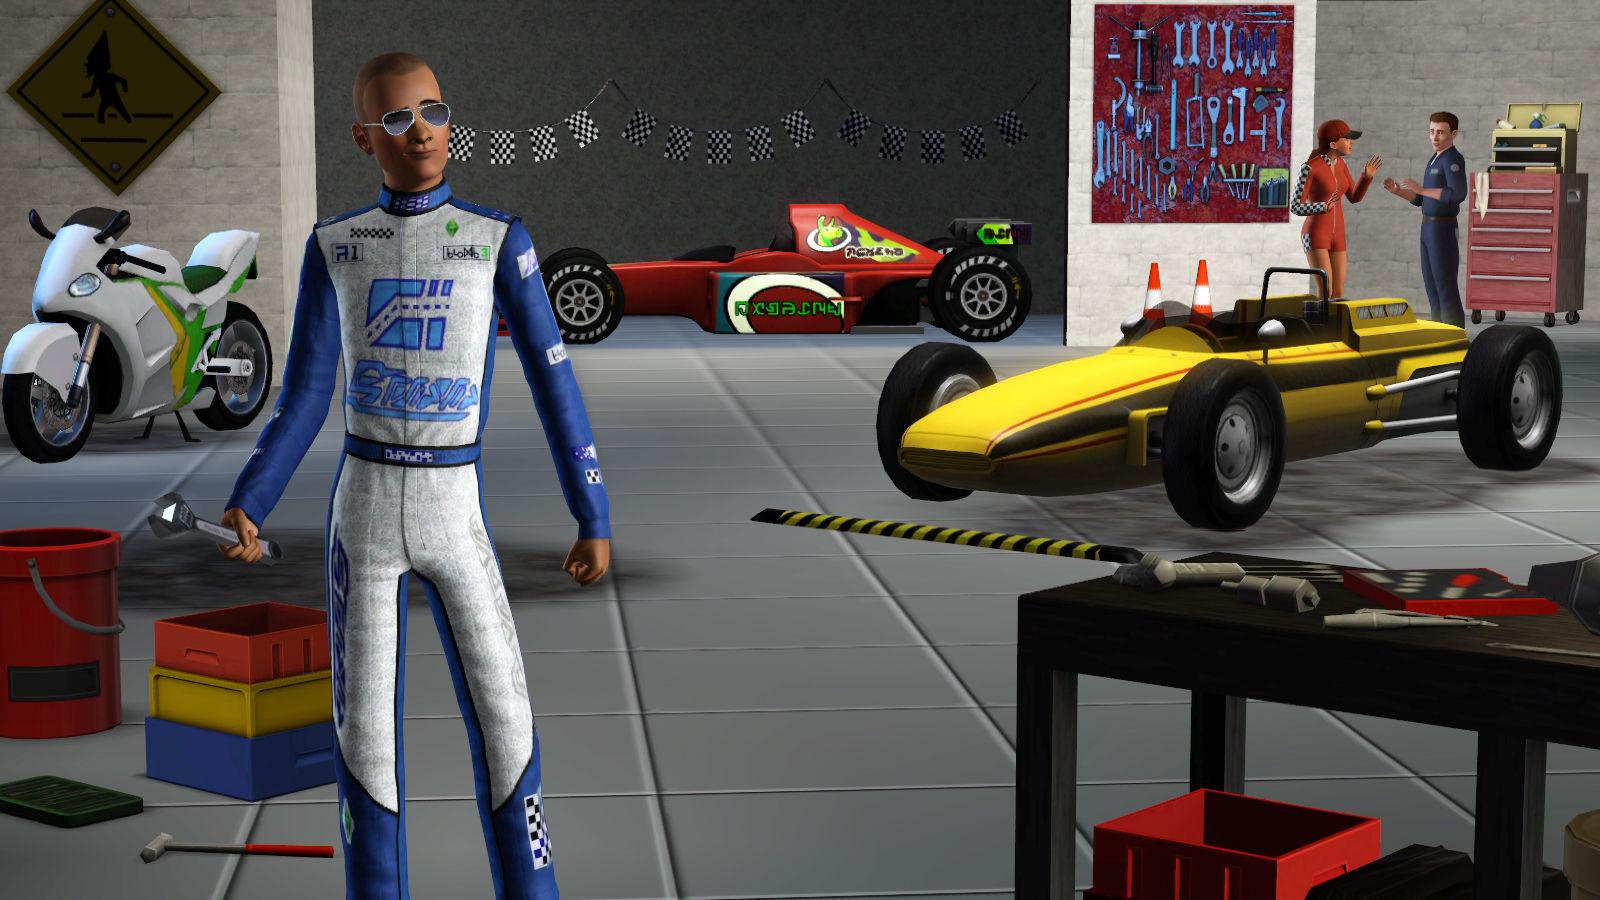 Sims 3 fast lane stuff (pc/mac) pc gaming electronic software.